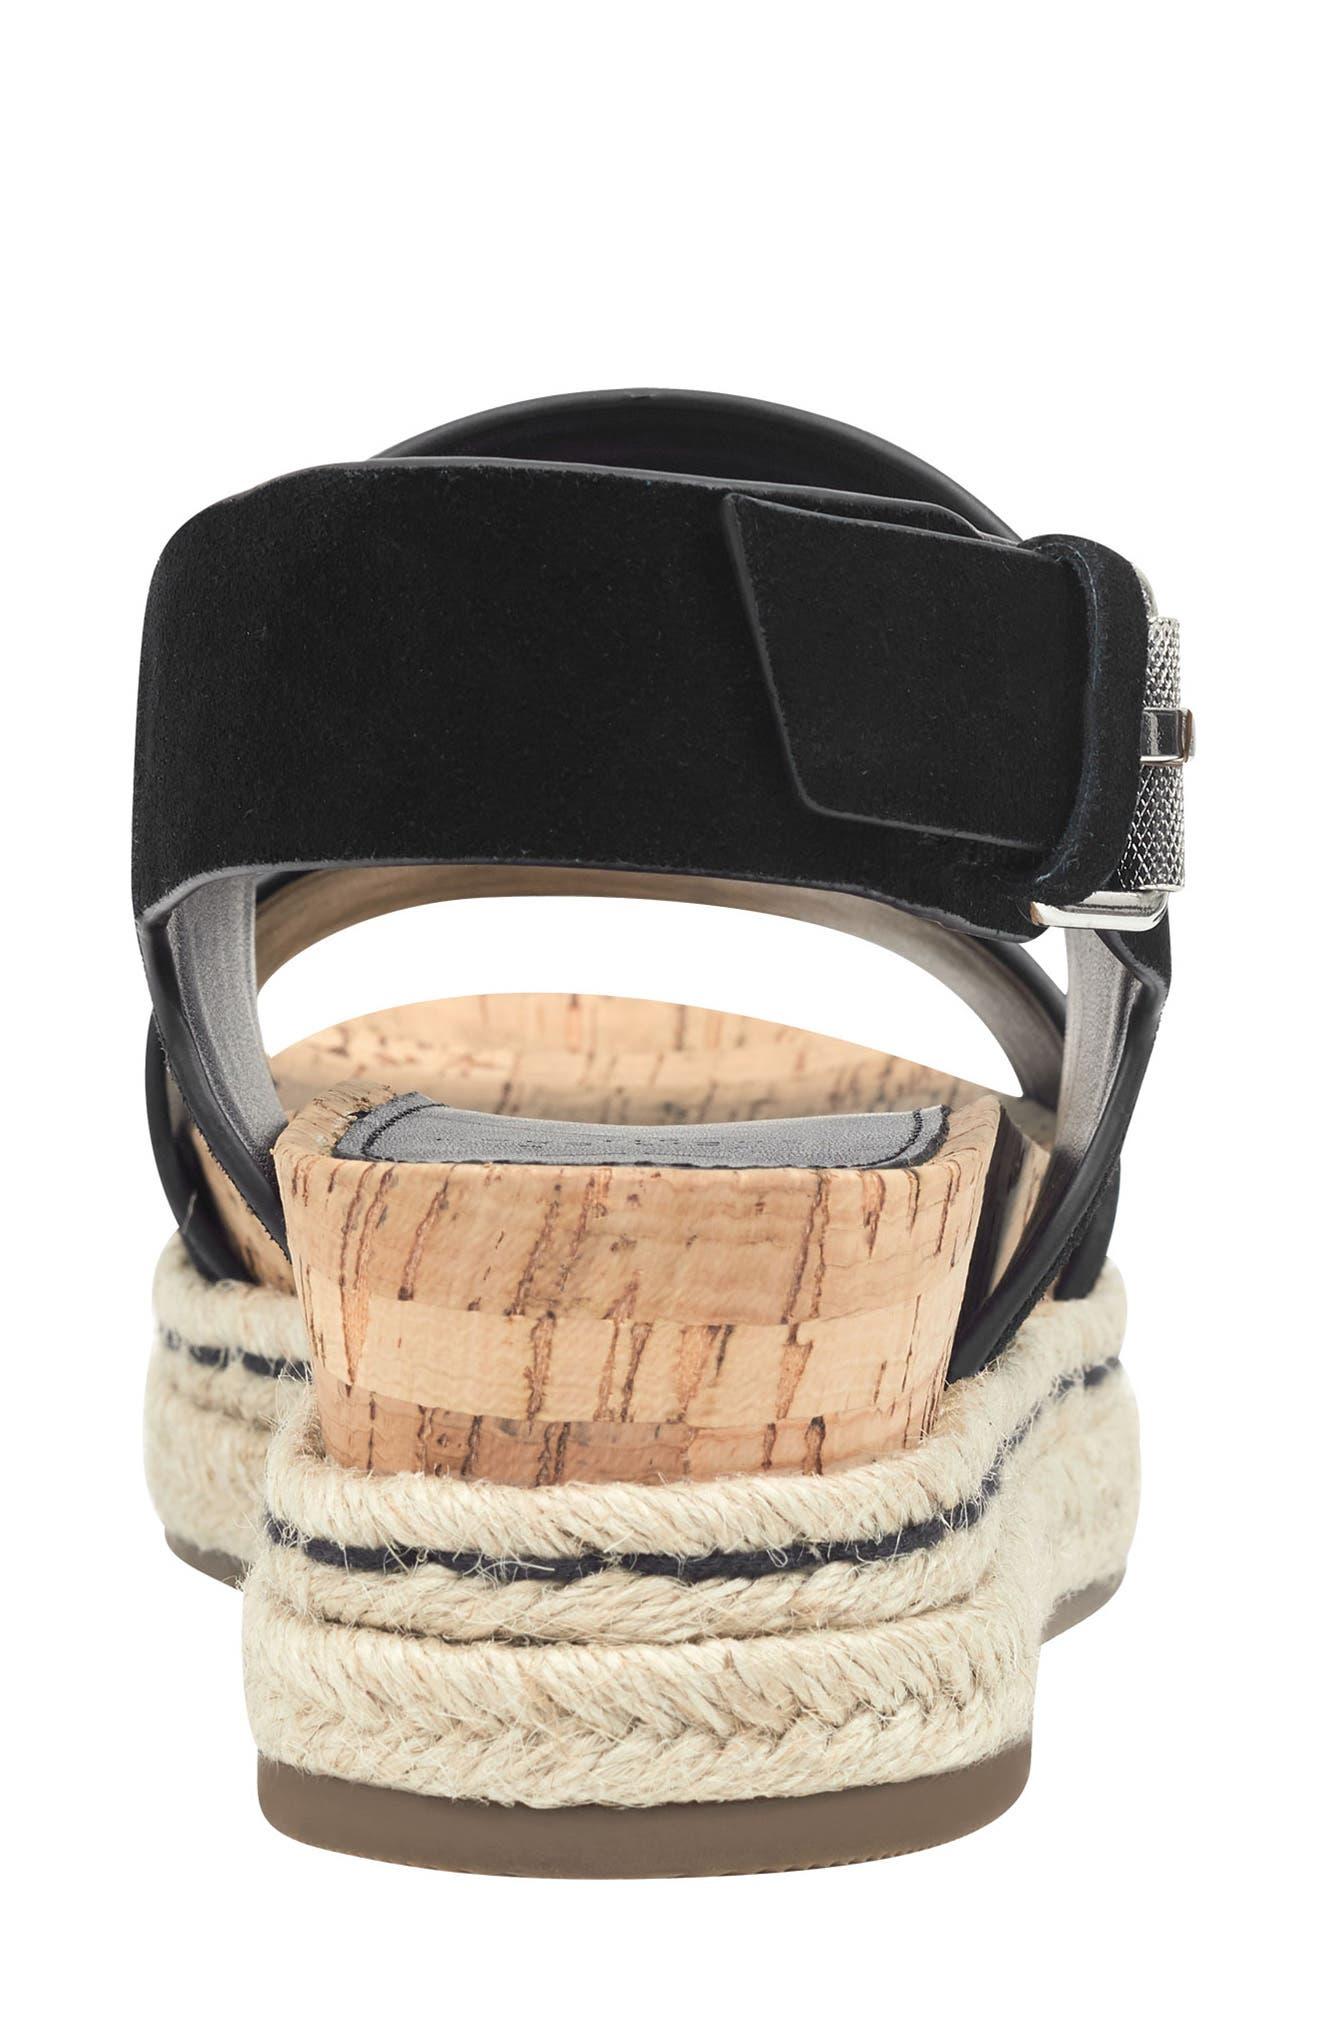 MARC FISHER LTD, Oria Espadrille Platform Sandal, Alternate thumbnail 7, color, BLACK SUEDE